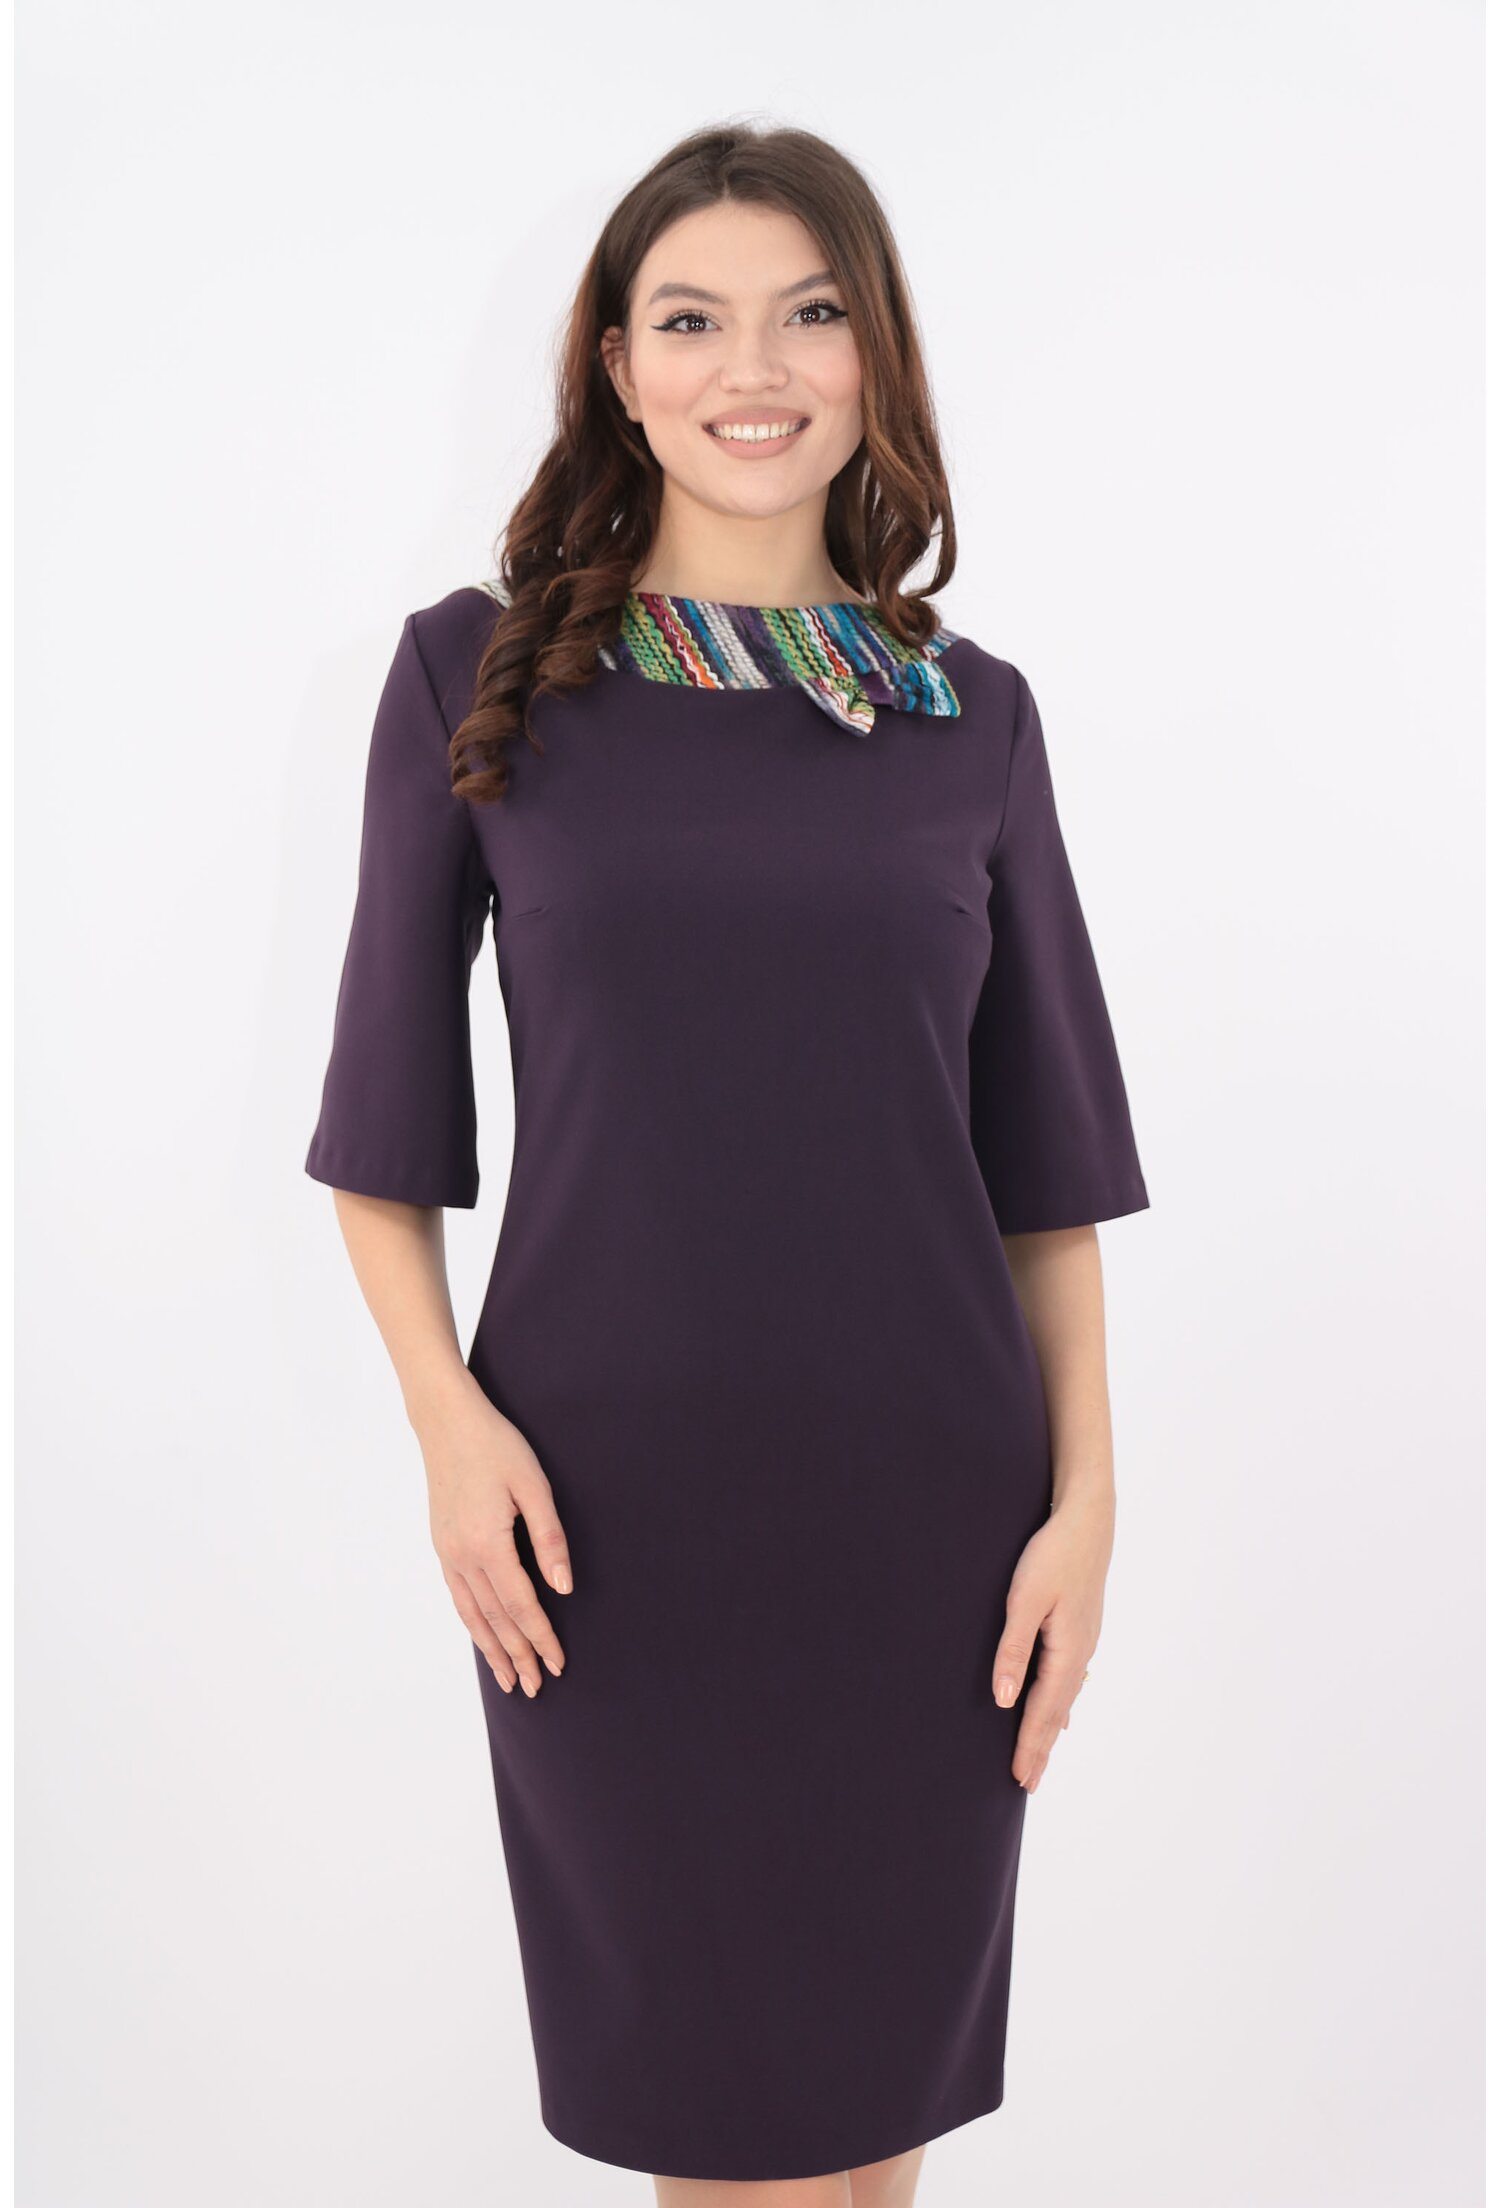 Rochie office violet cu garnituri multicolore